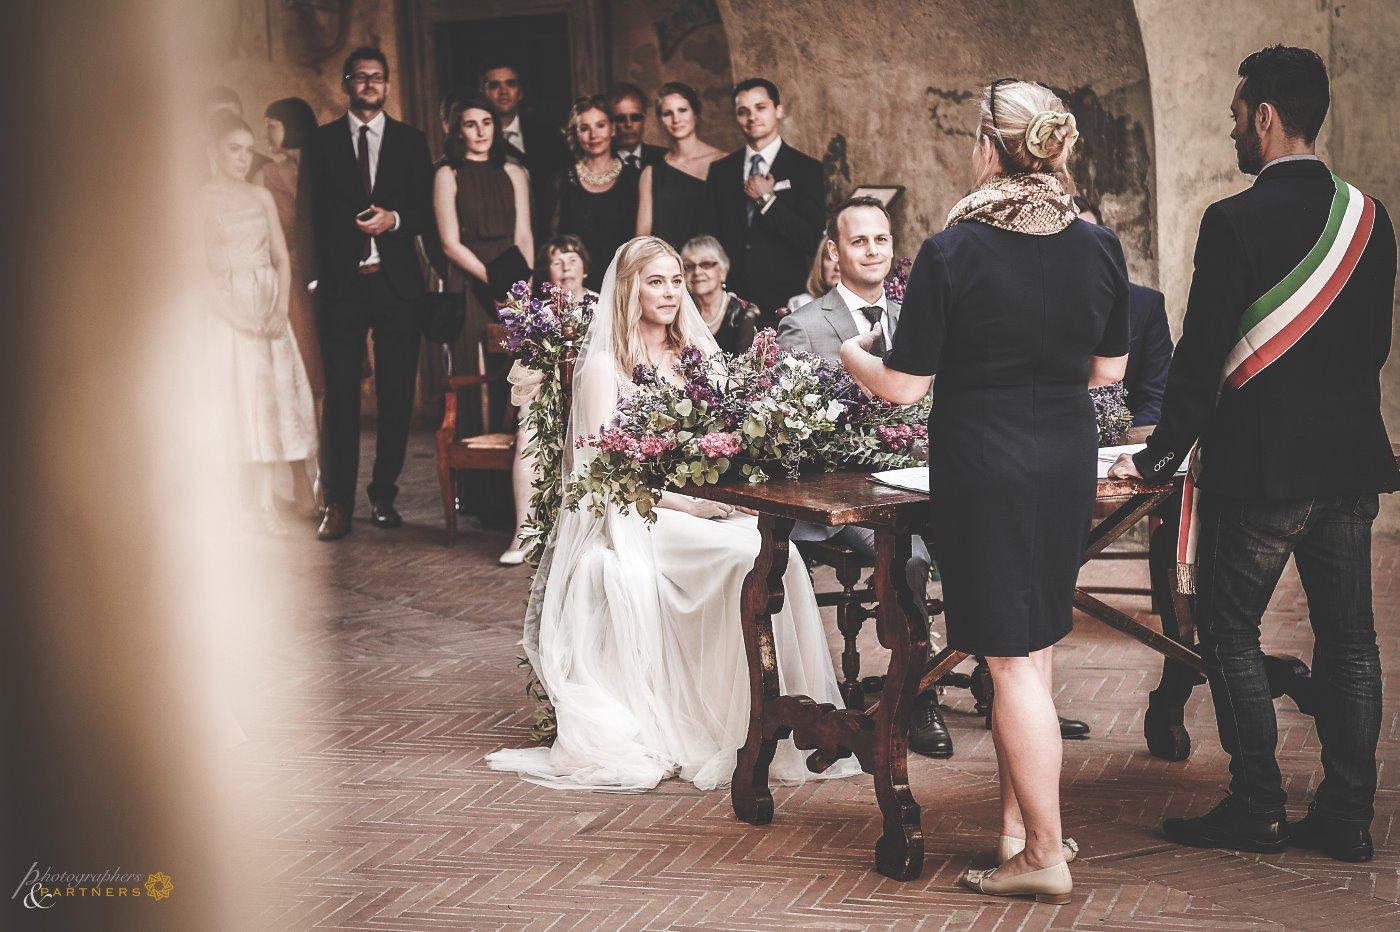 photographers_weddings_certaldo_06.jpg